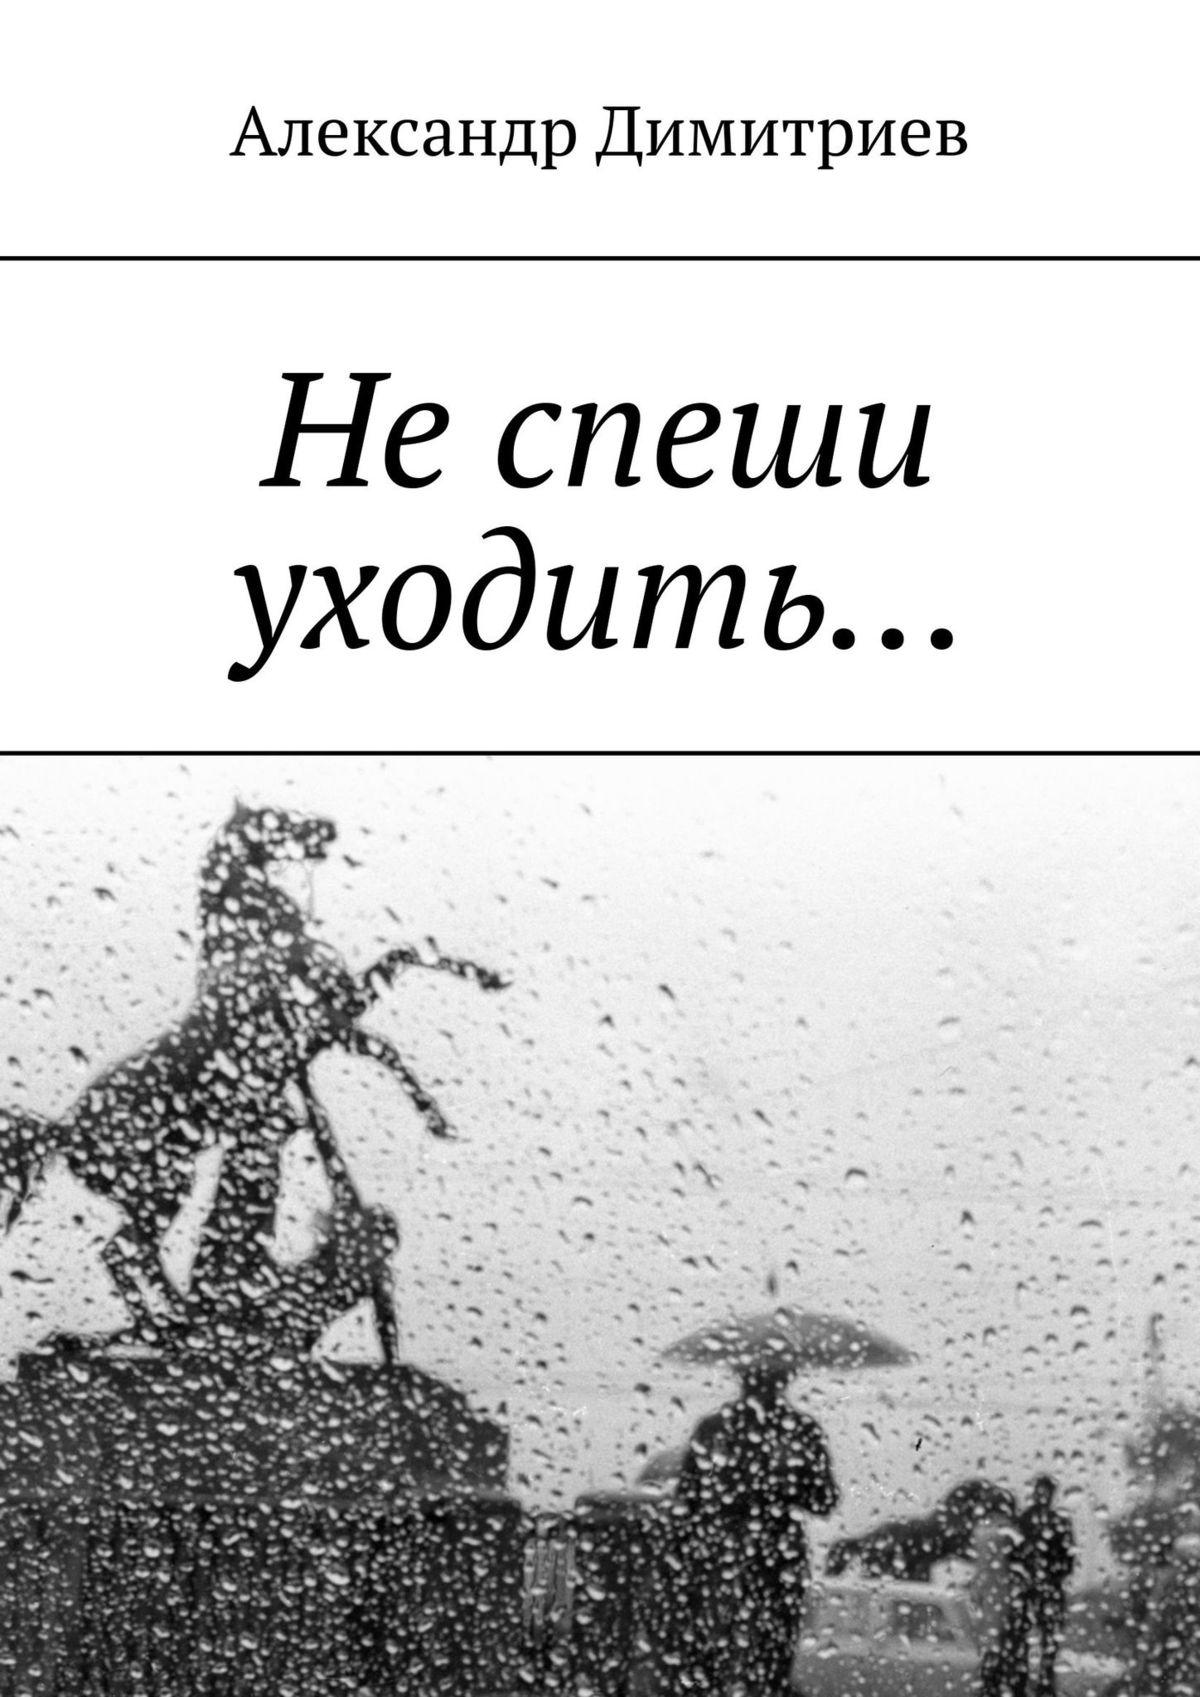 Не спеши уходить…